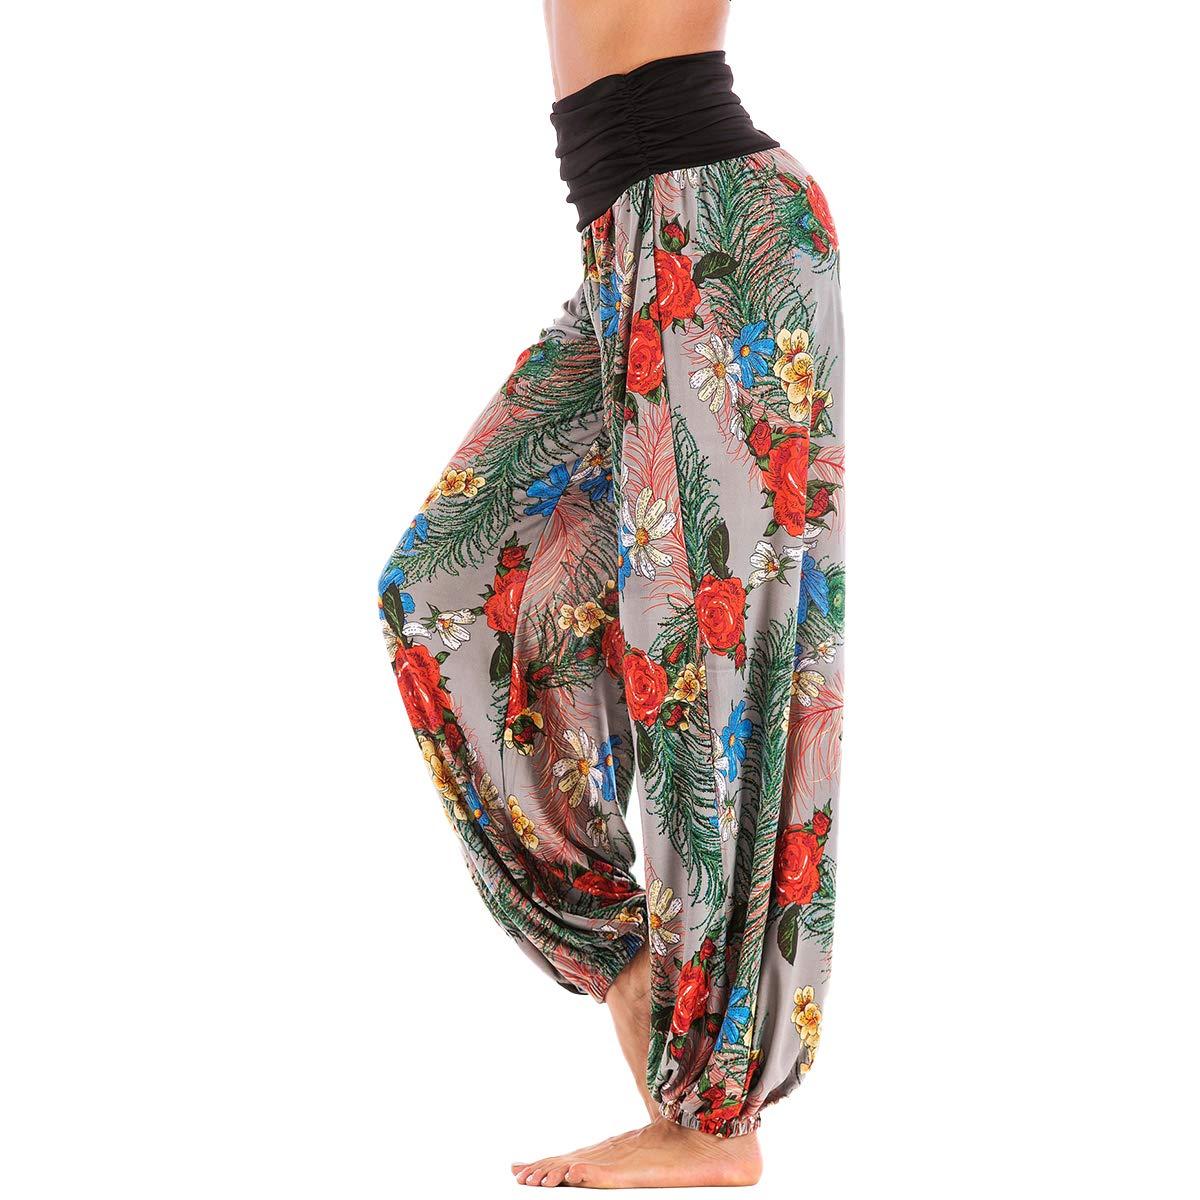 1a15e3616307e Amazon.com: Yoga Pants Women's Loose Baggy Harem Long Petite Floral Leopard  Smocked Waist Casual Hippie Flowy Palazzo Beach Trousers: Clothing